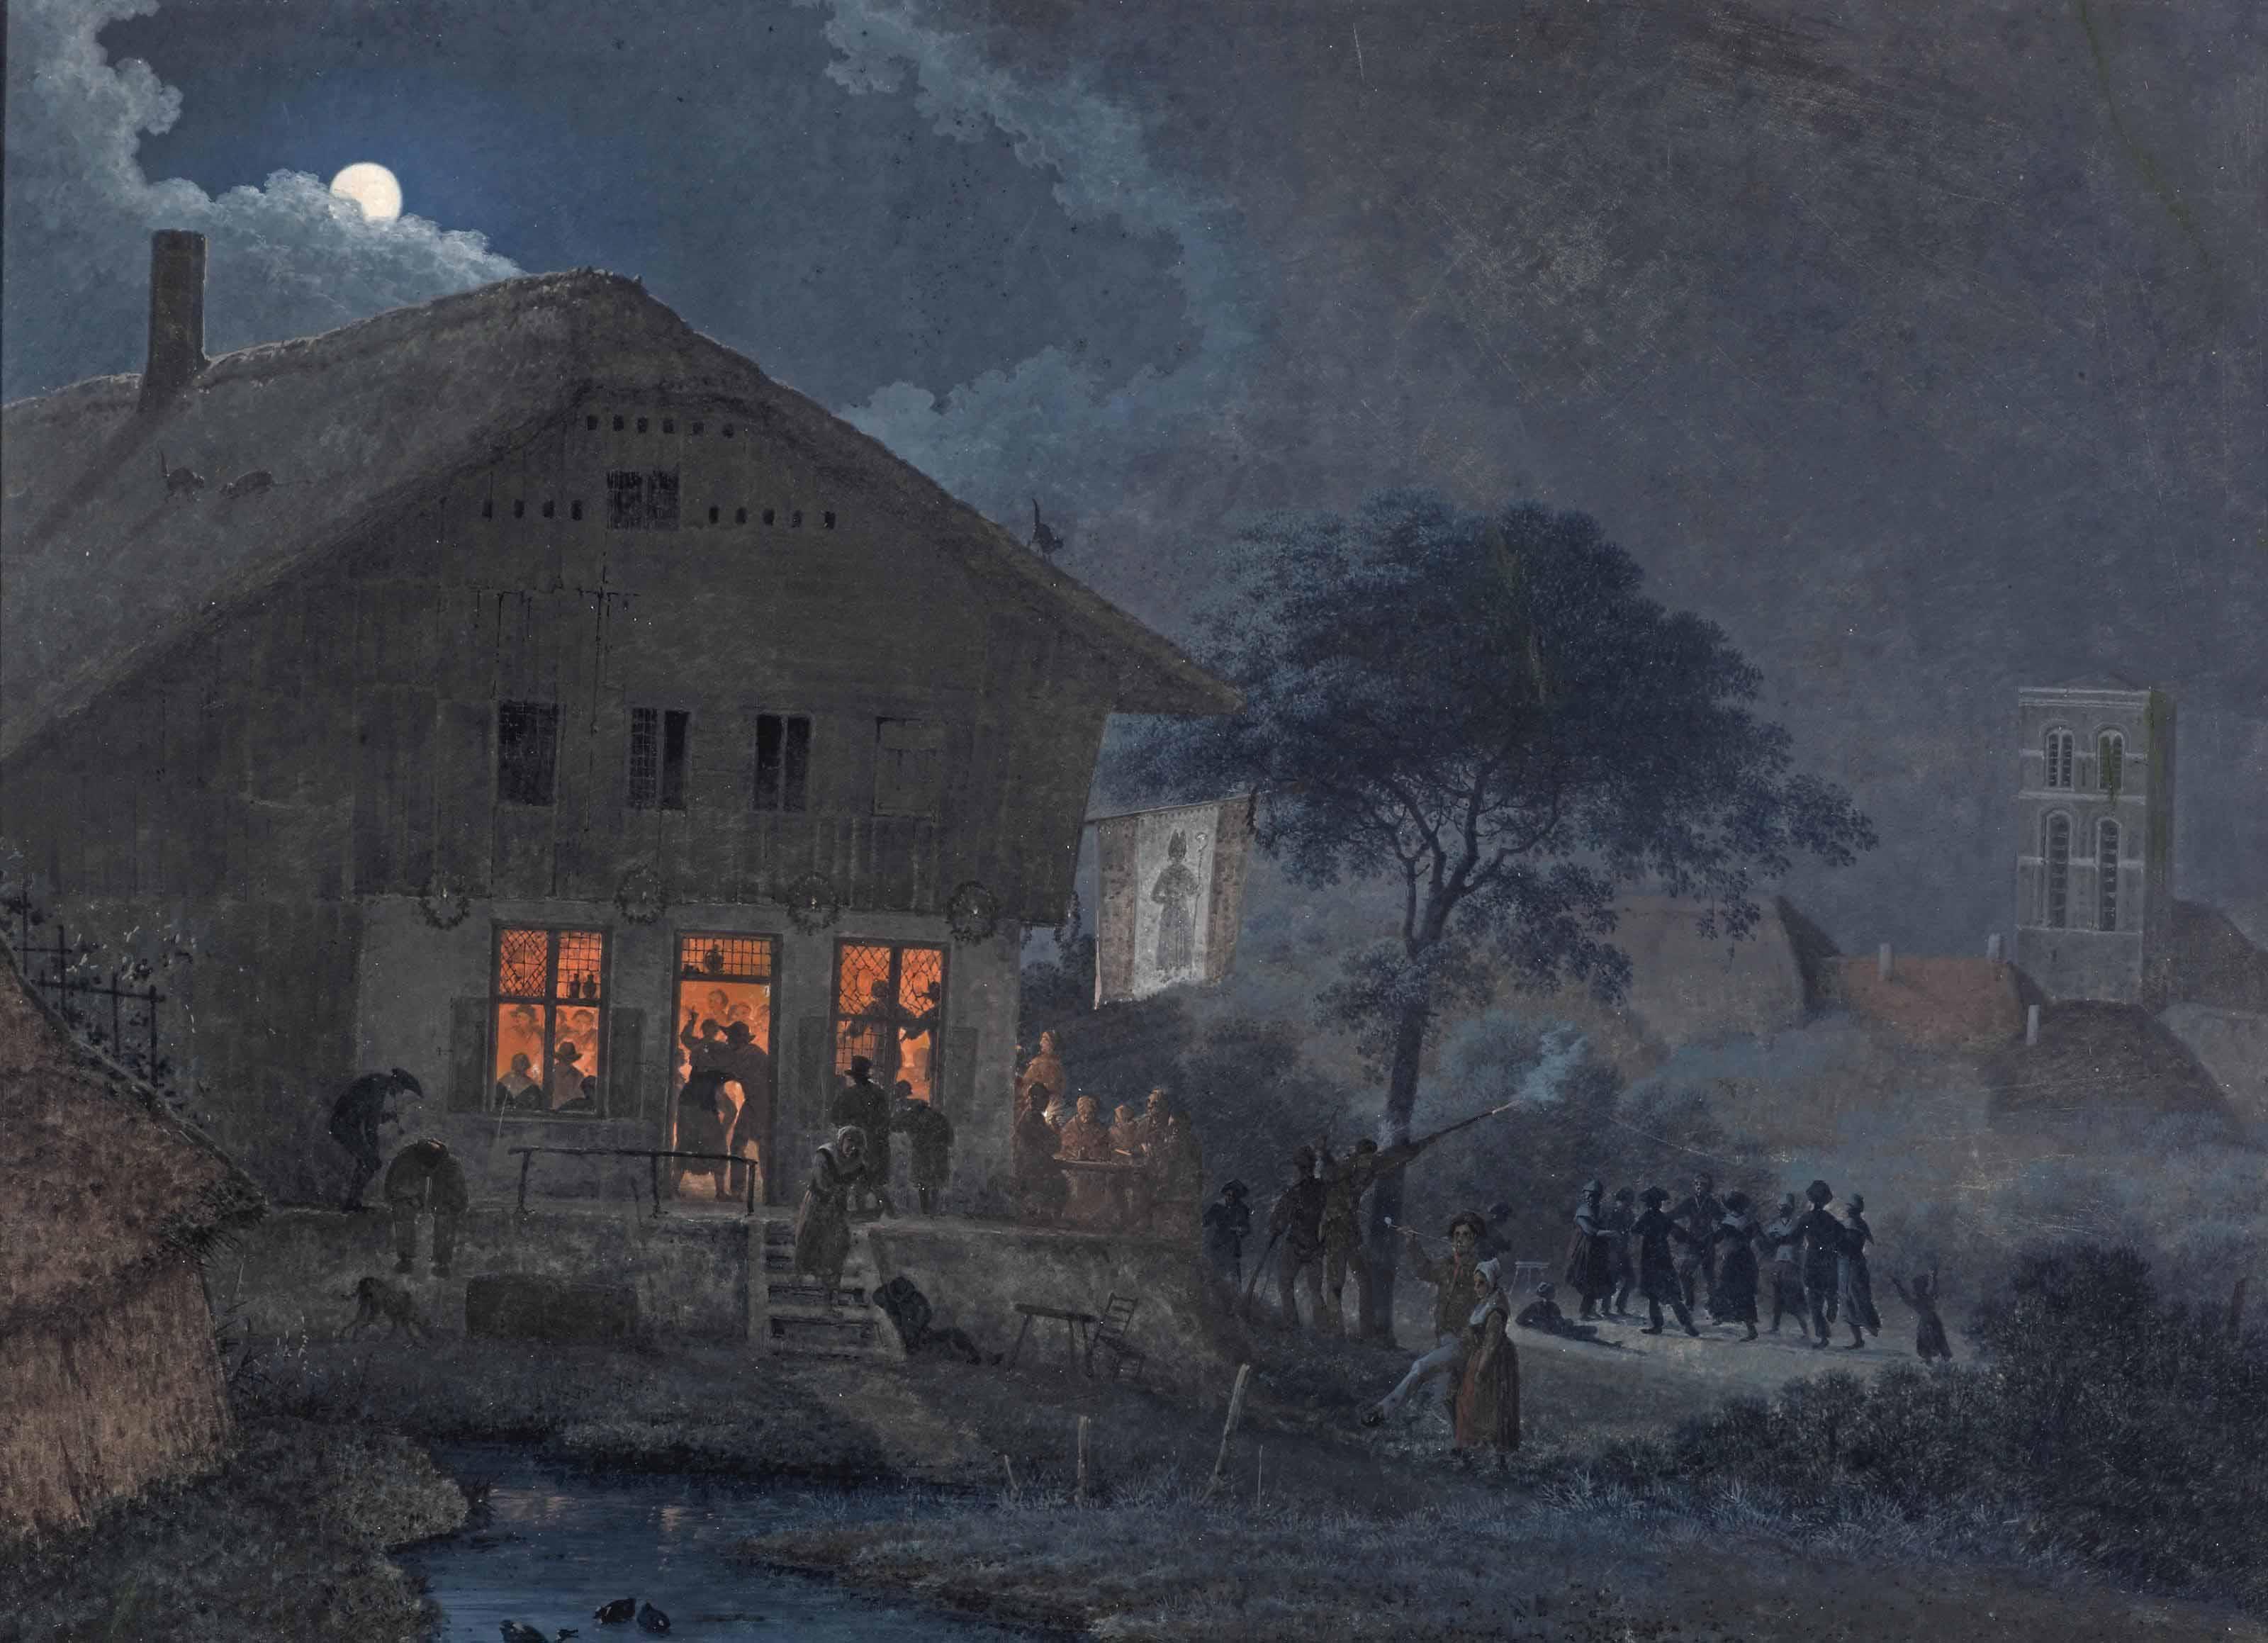 A feast by full moon near a village inn